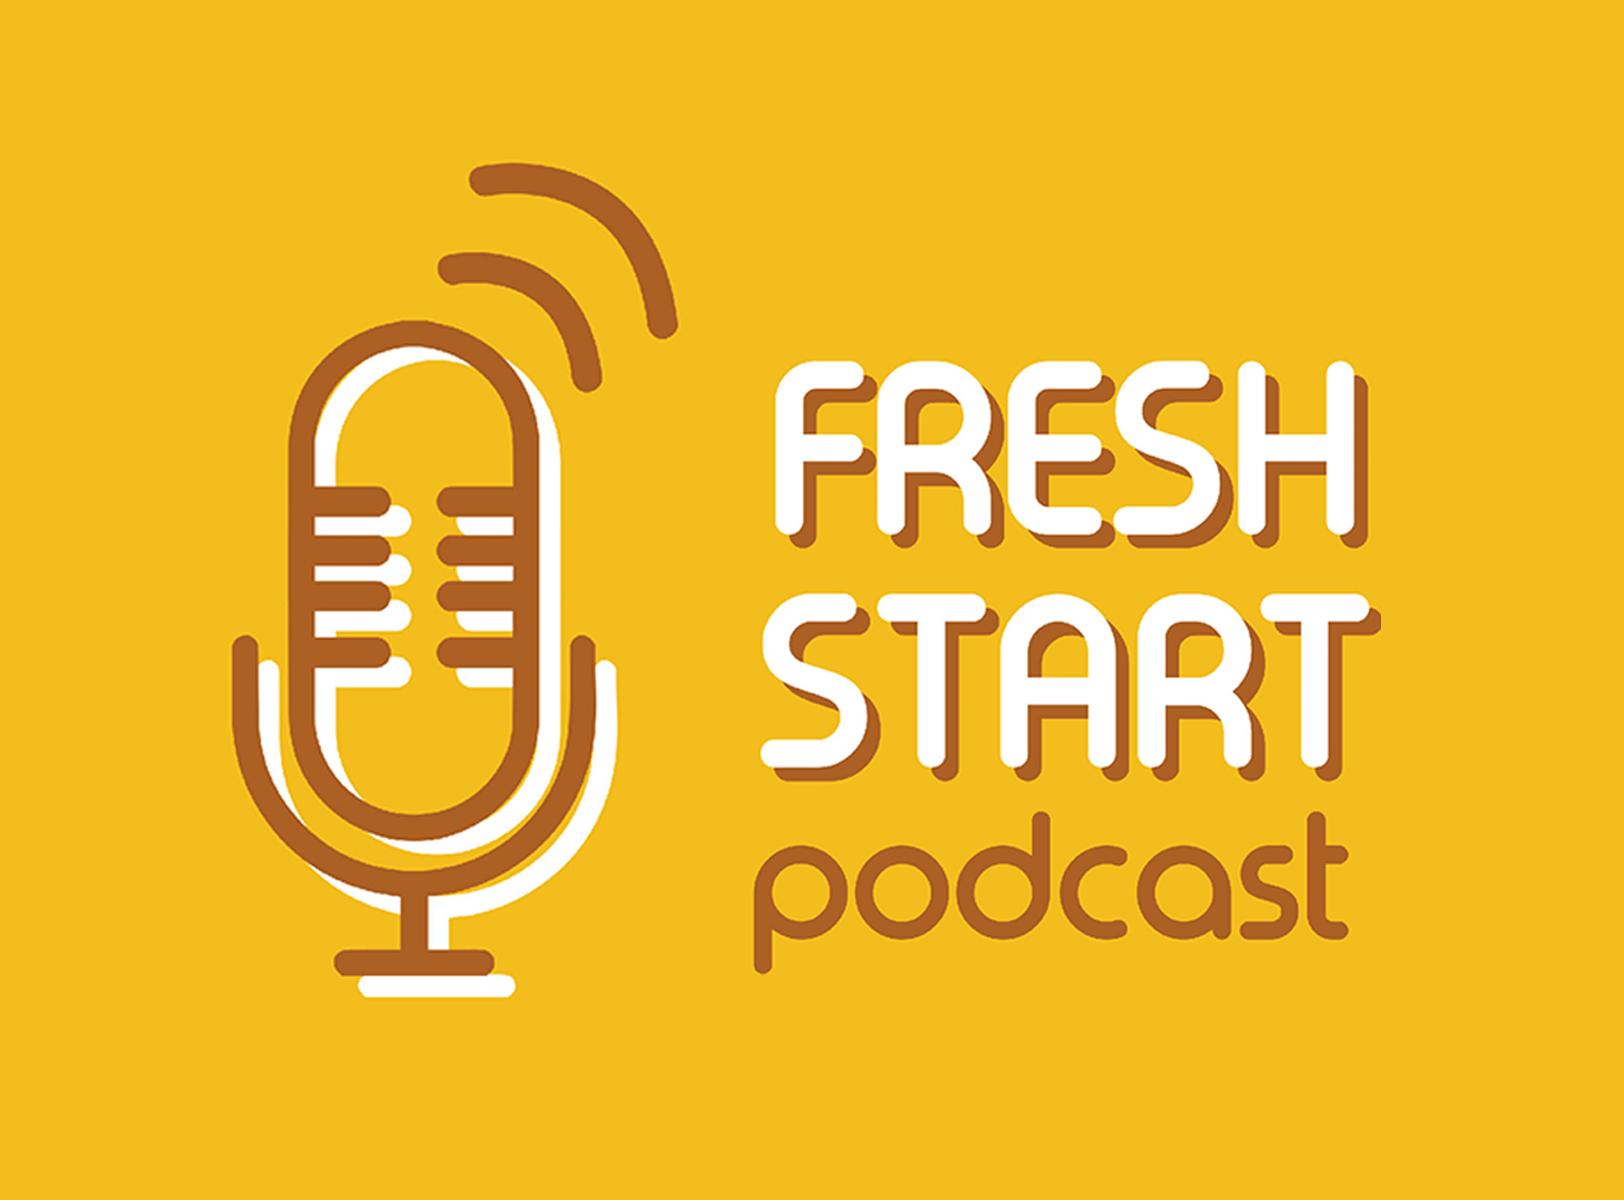 Fresh Start: Podcast News (1/24/2020 Fri.)